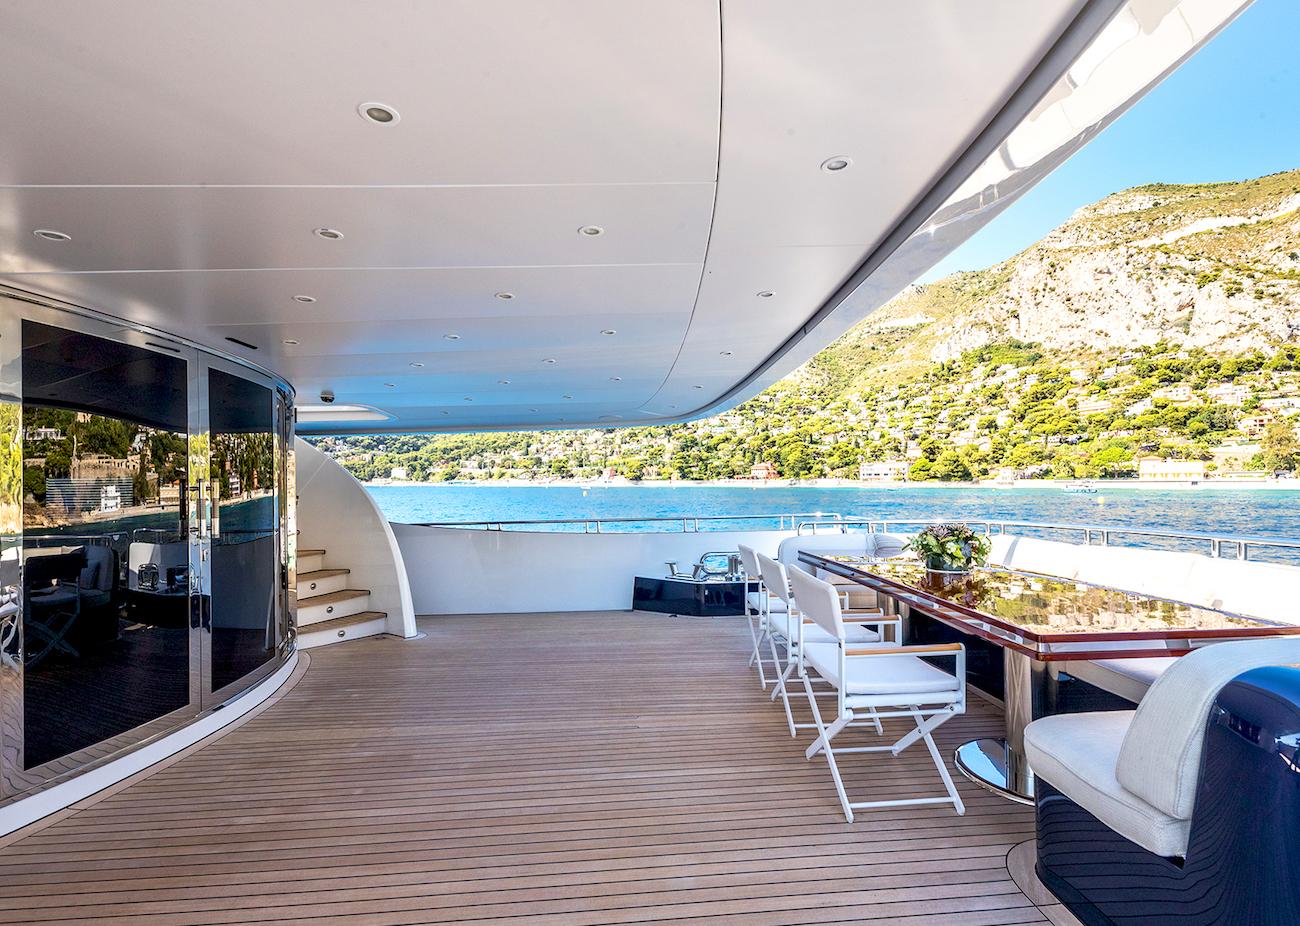 Aft Deck Dining Option